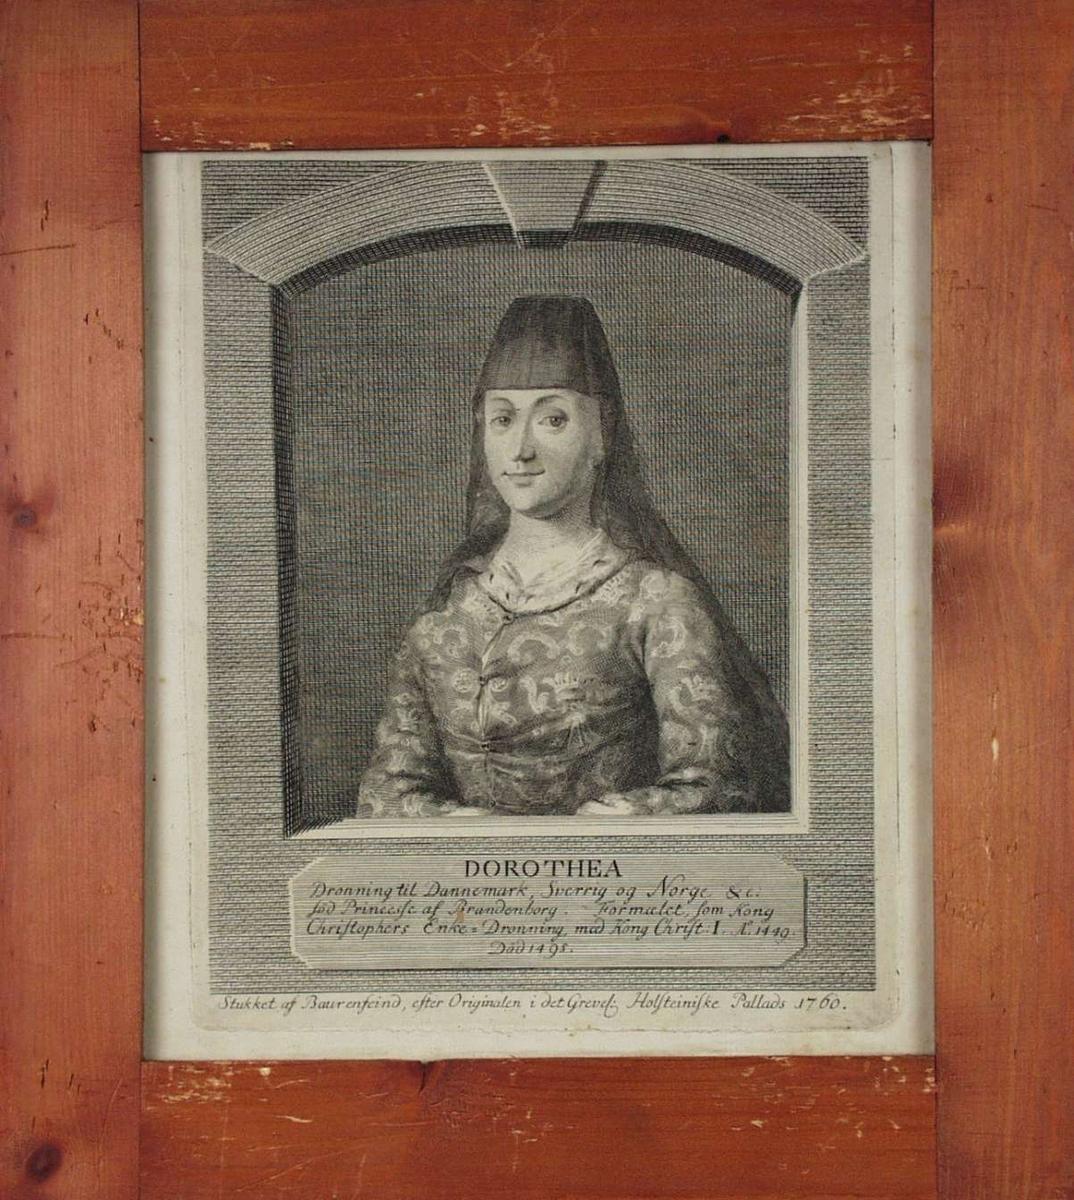 Portrett av Dronning Dorothea.